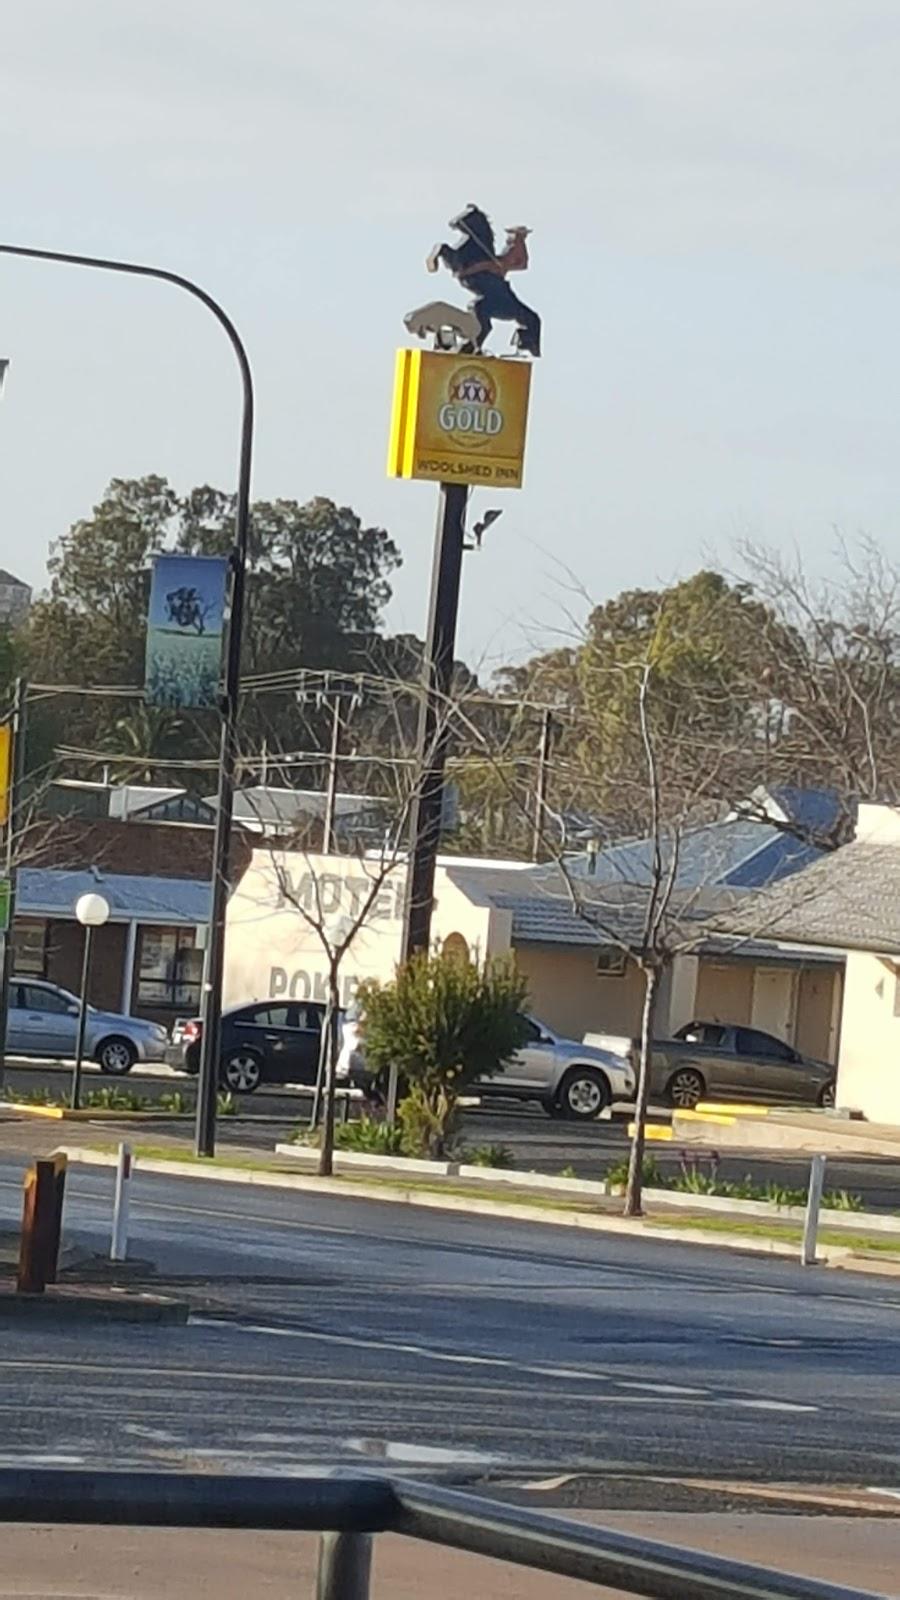 Caltex Bordertown | gas station | 41 North Terrace, Bordertown SA 5268, Australia | 0887521365 OR +61 8 8752 1365